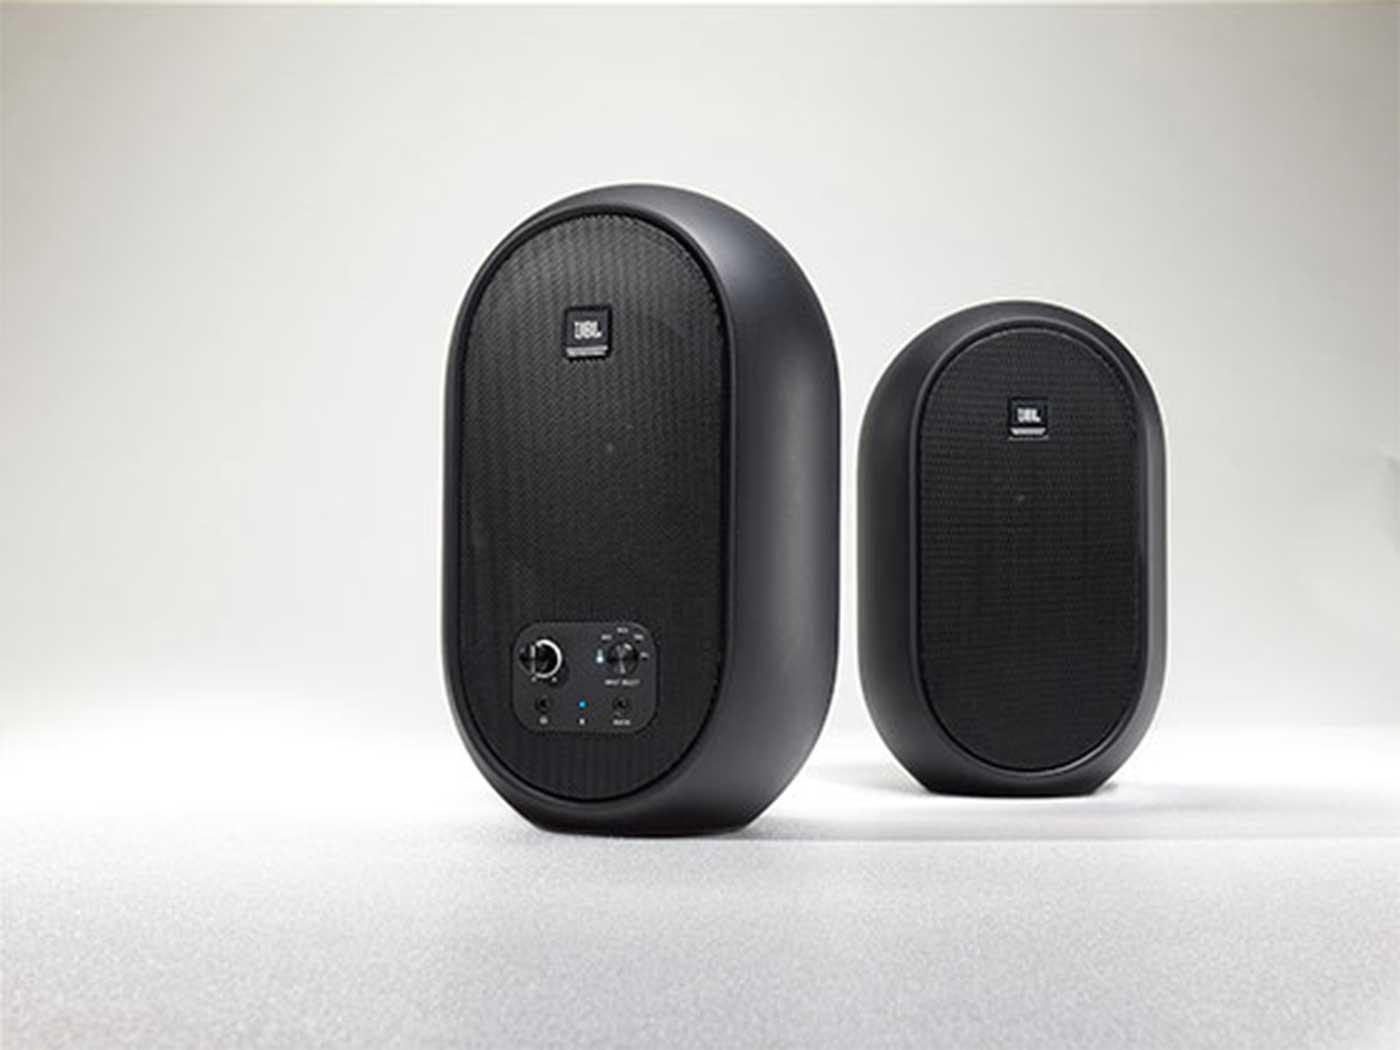 JBL One Series 104 gets a Bluetooth-equipped relaunch - MusicTech